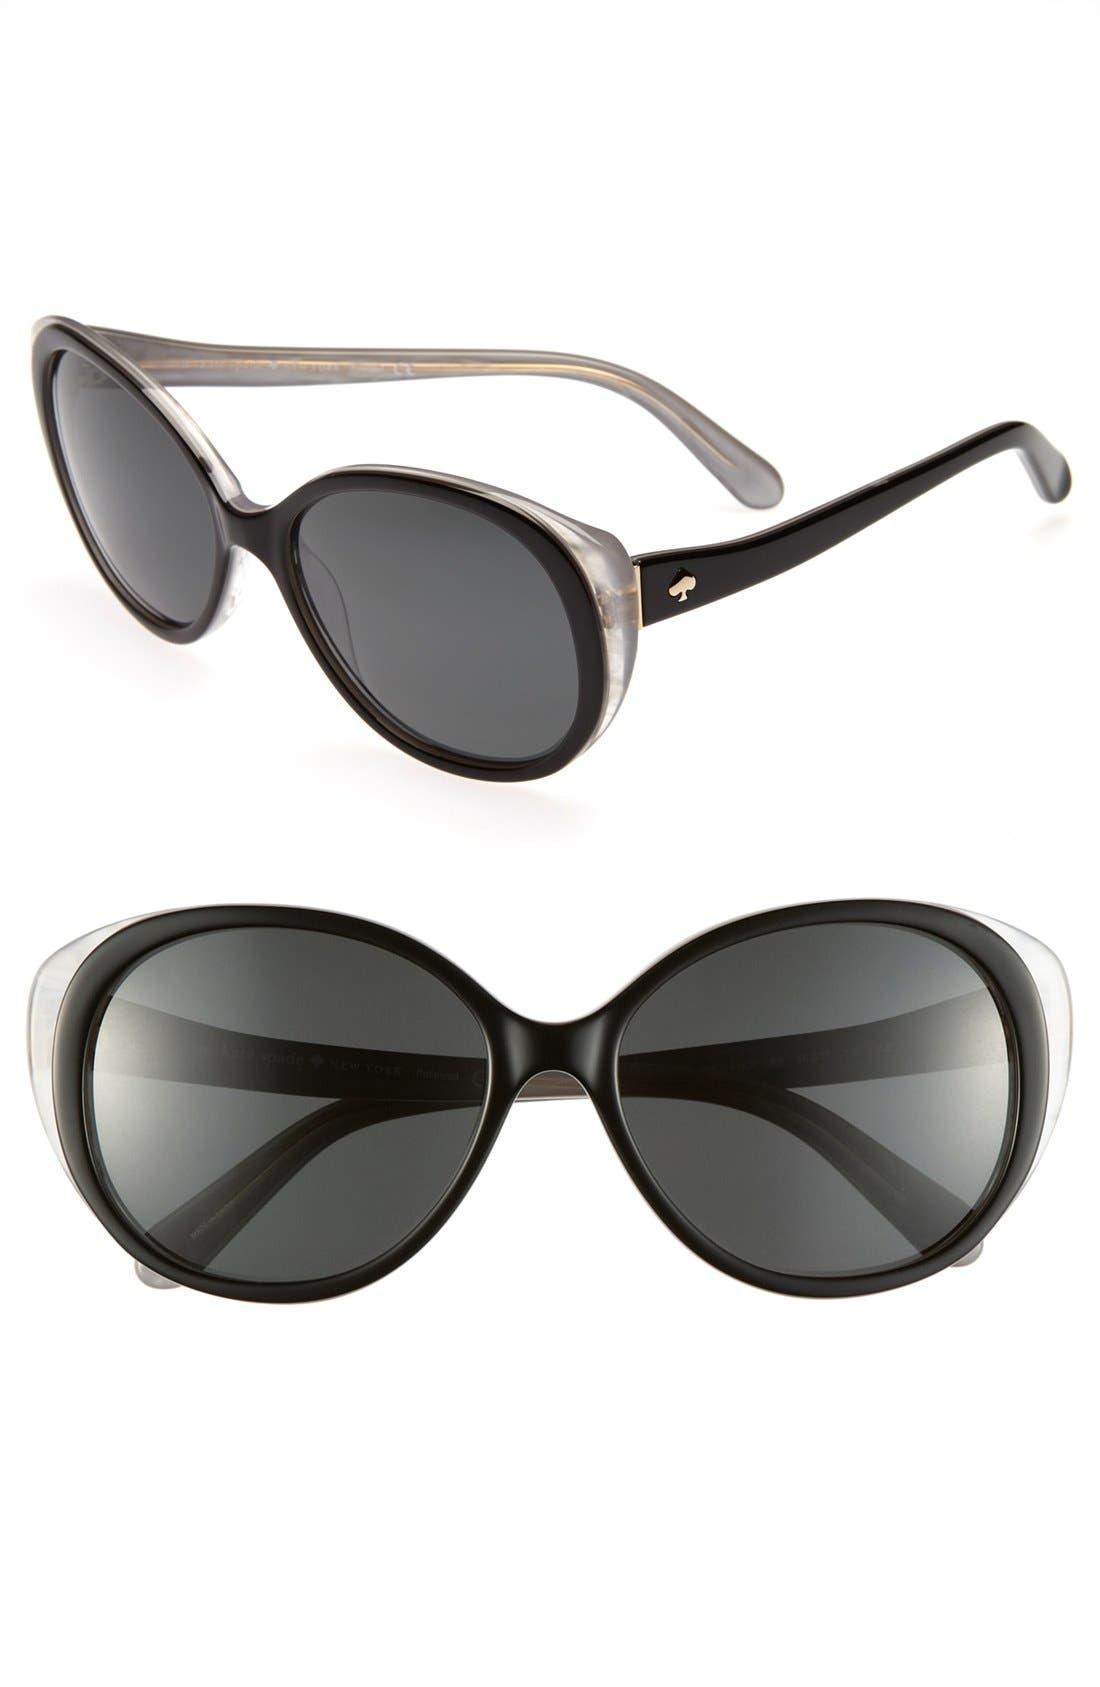 Alternate Image 1 Selected - kate spade new york 'finola' 56mm polarized sunglasses